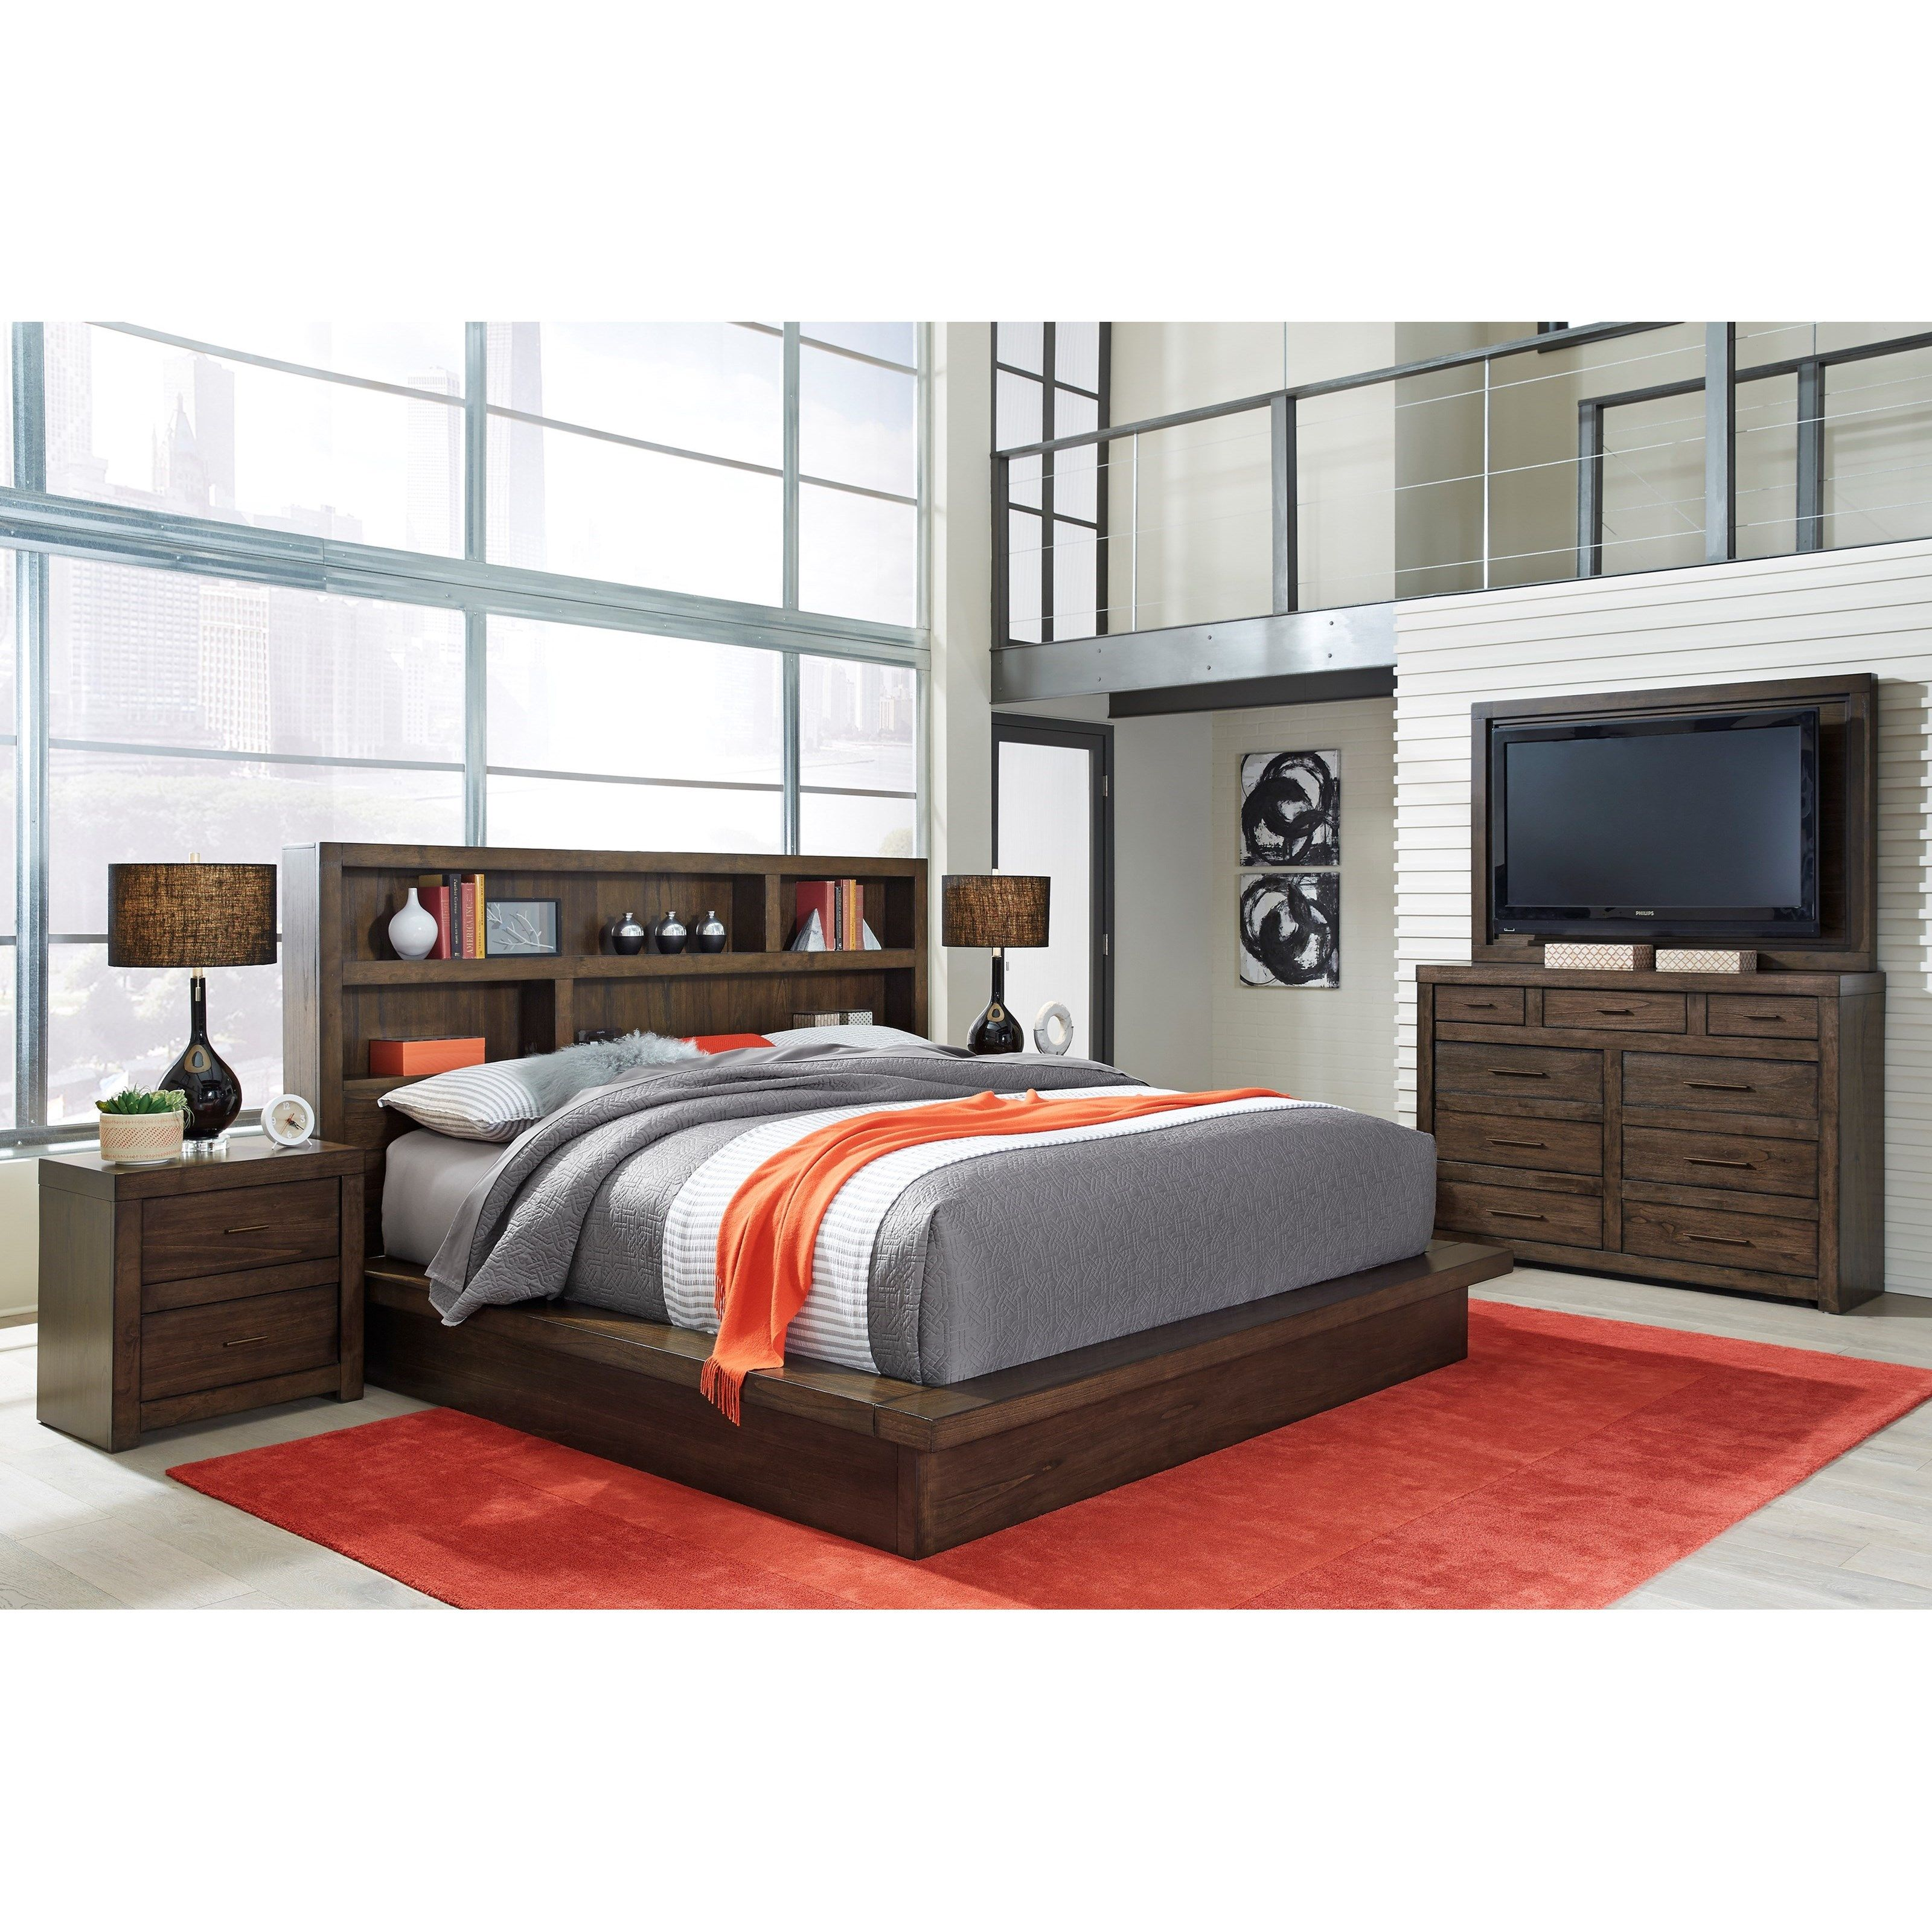 Best Modern Loft California King Bedroom Group By Aspenhome 400 x 300